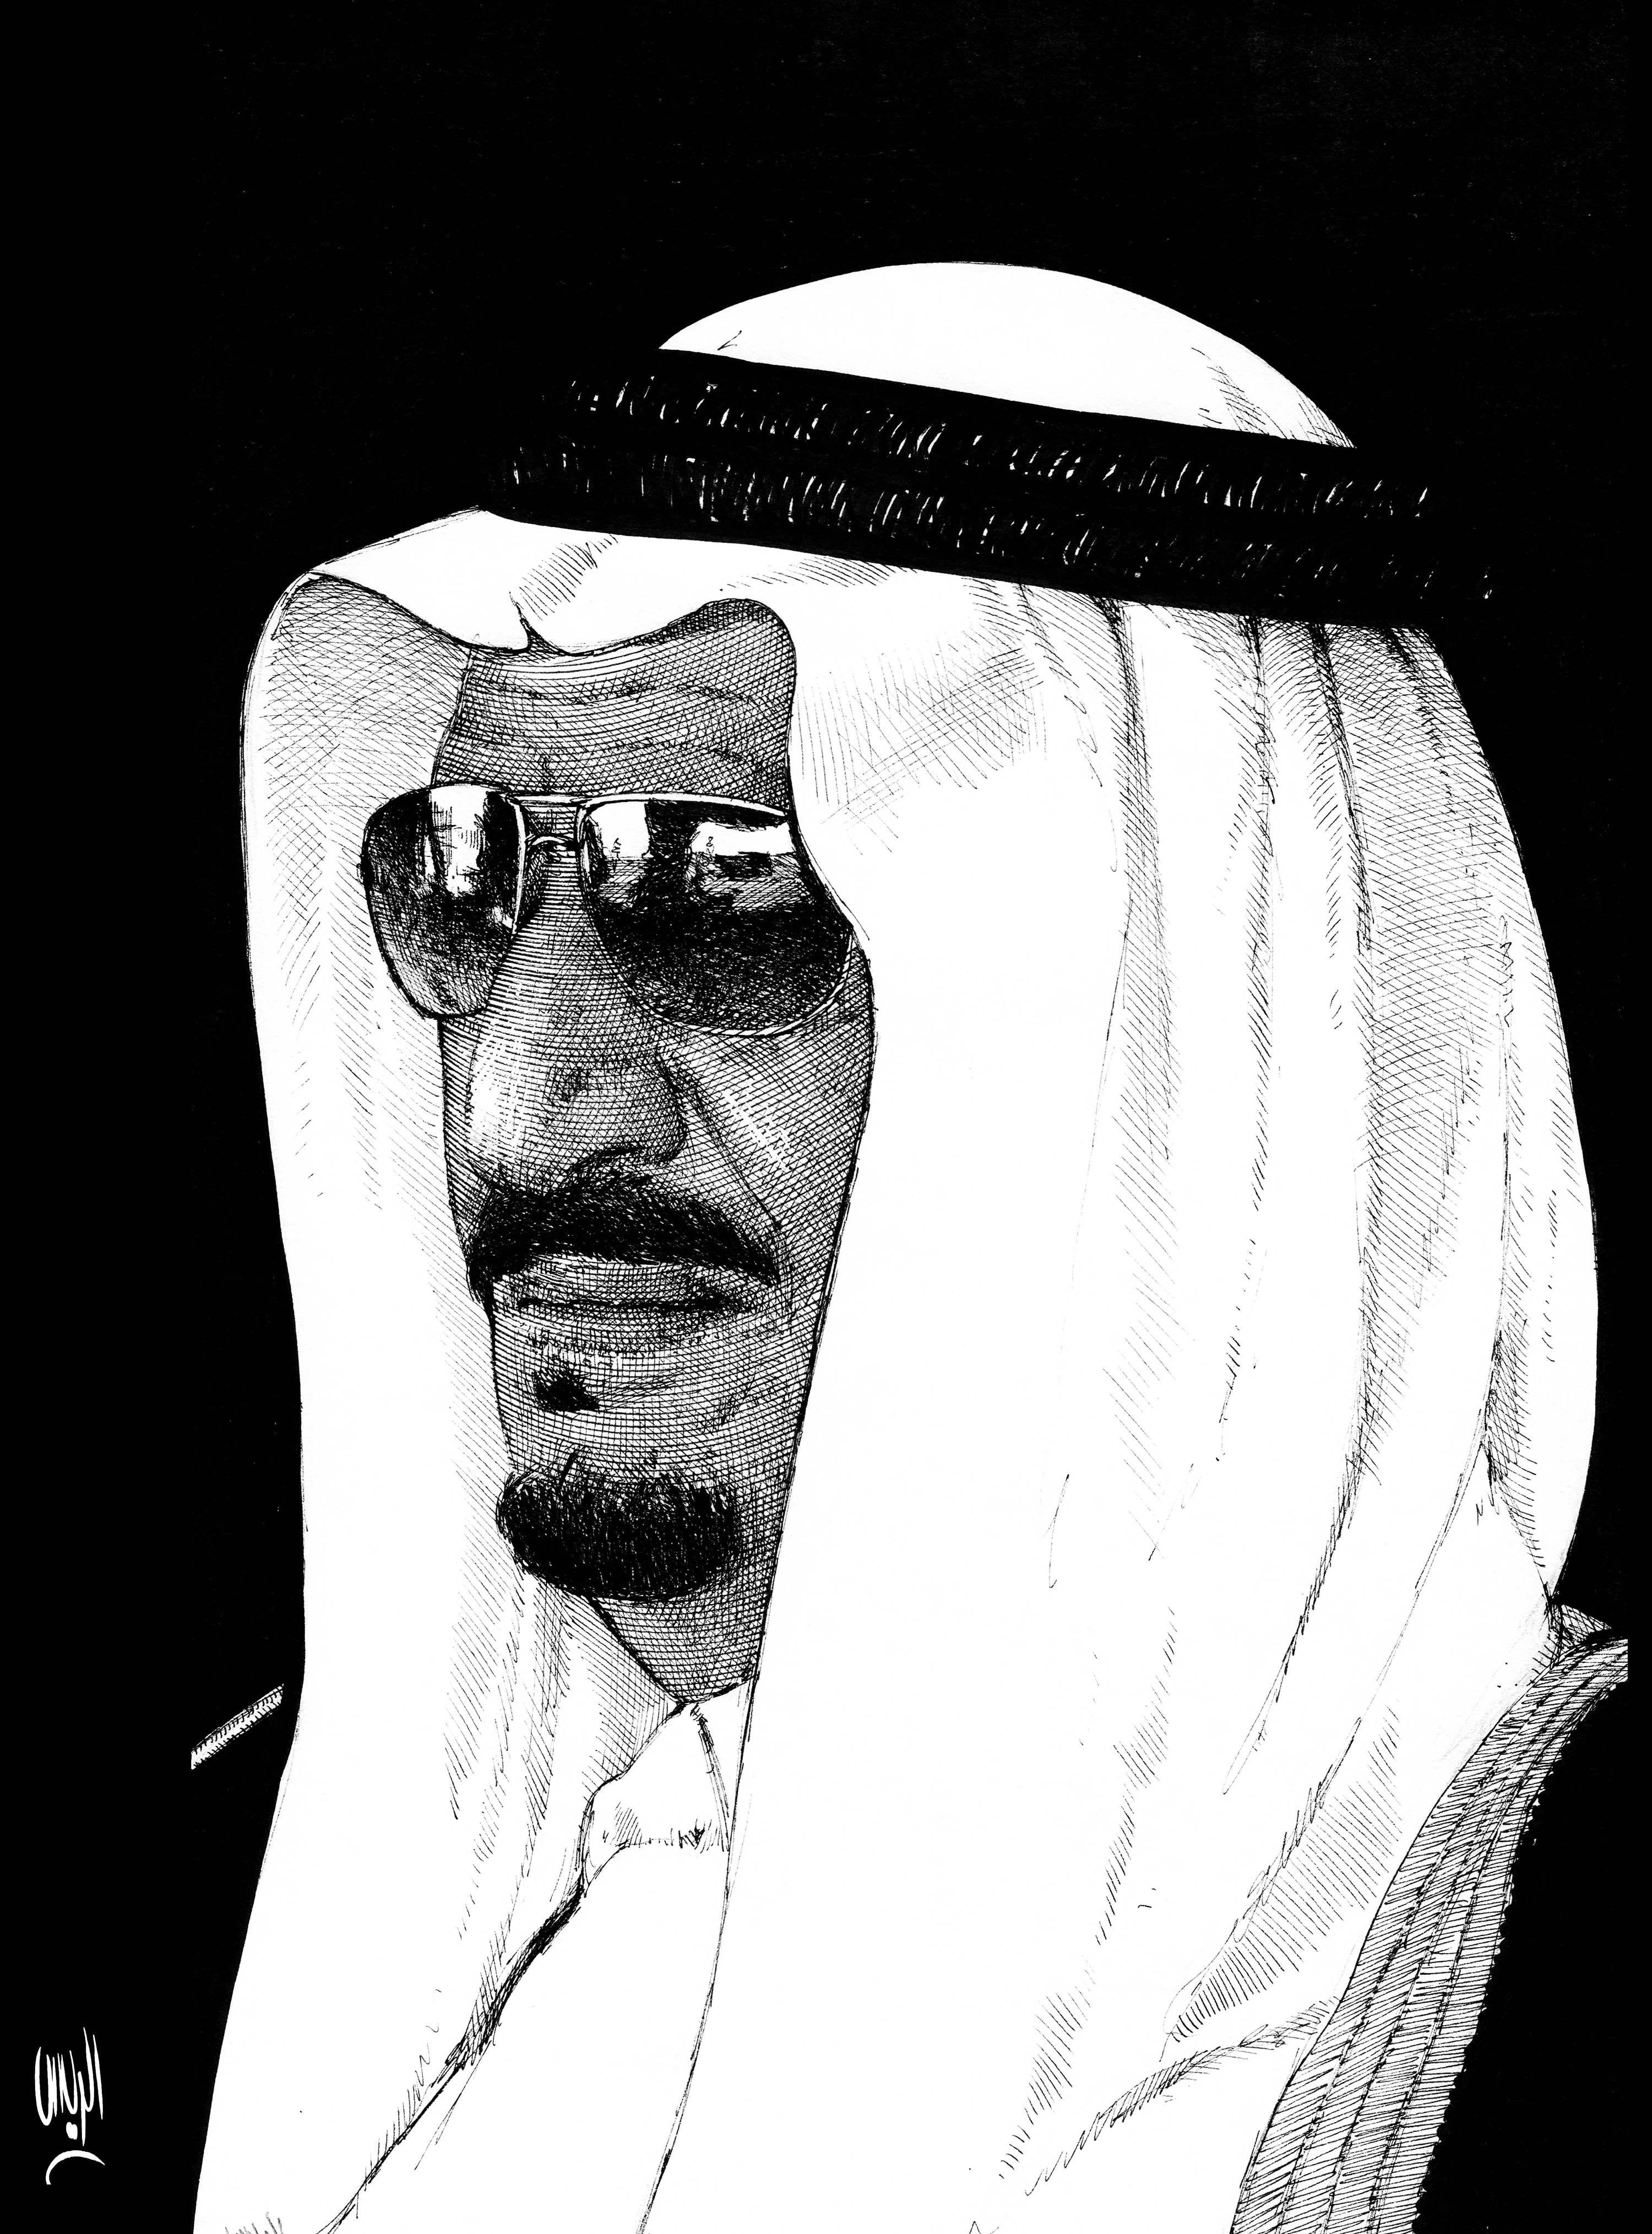 King Salman Bin Abdulaziz الملك سلمان Photo Awards Photo Art Cowboy Art